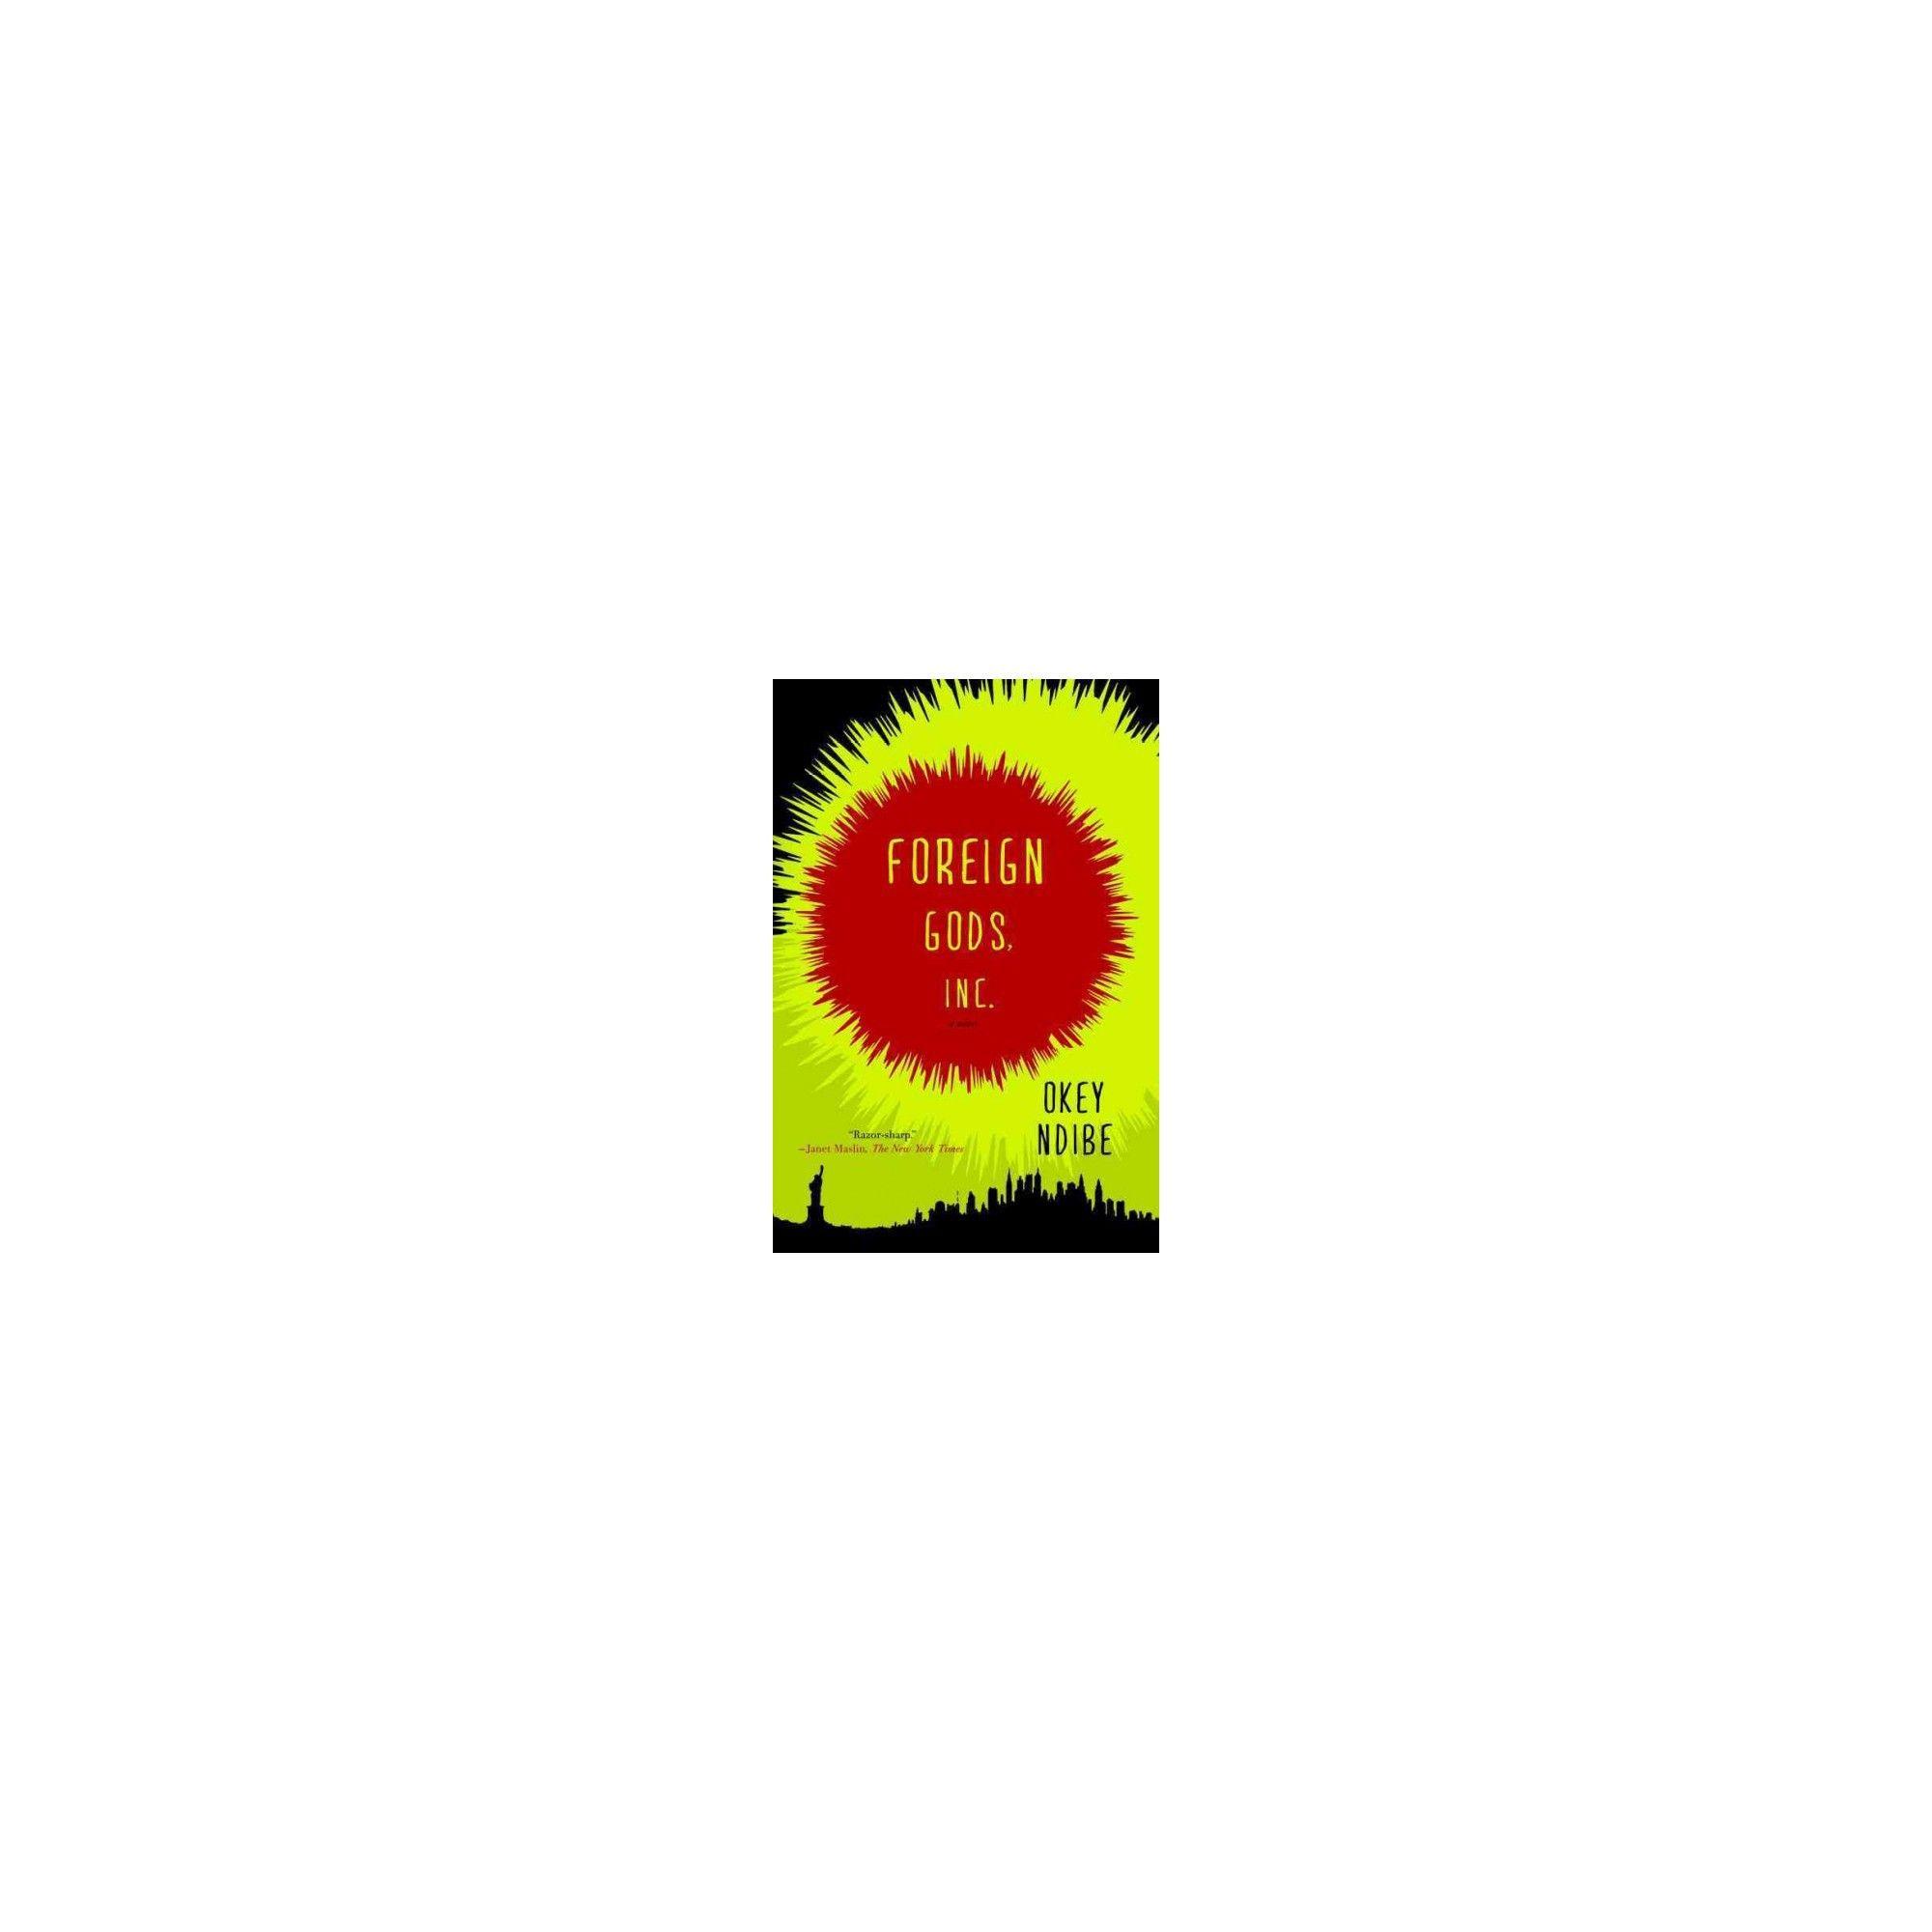 Foreign Gods, Inc. by Okey Ndibe (Paperback) Best